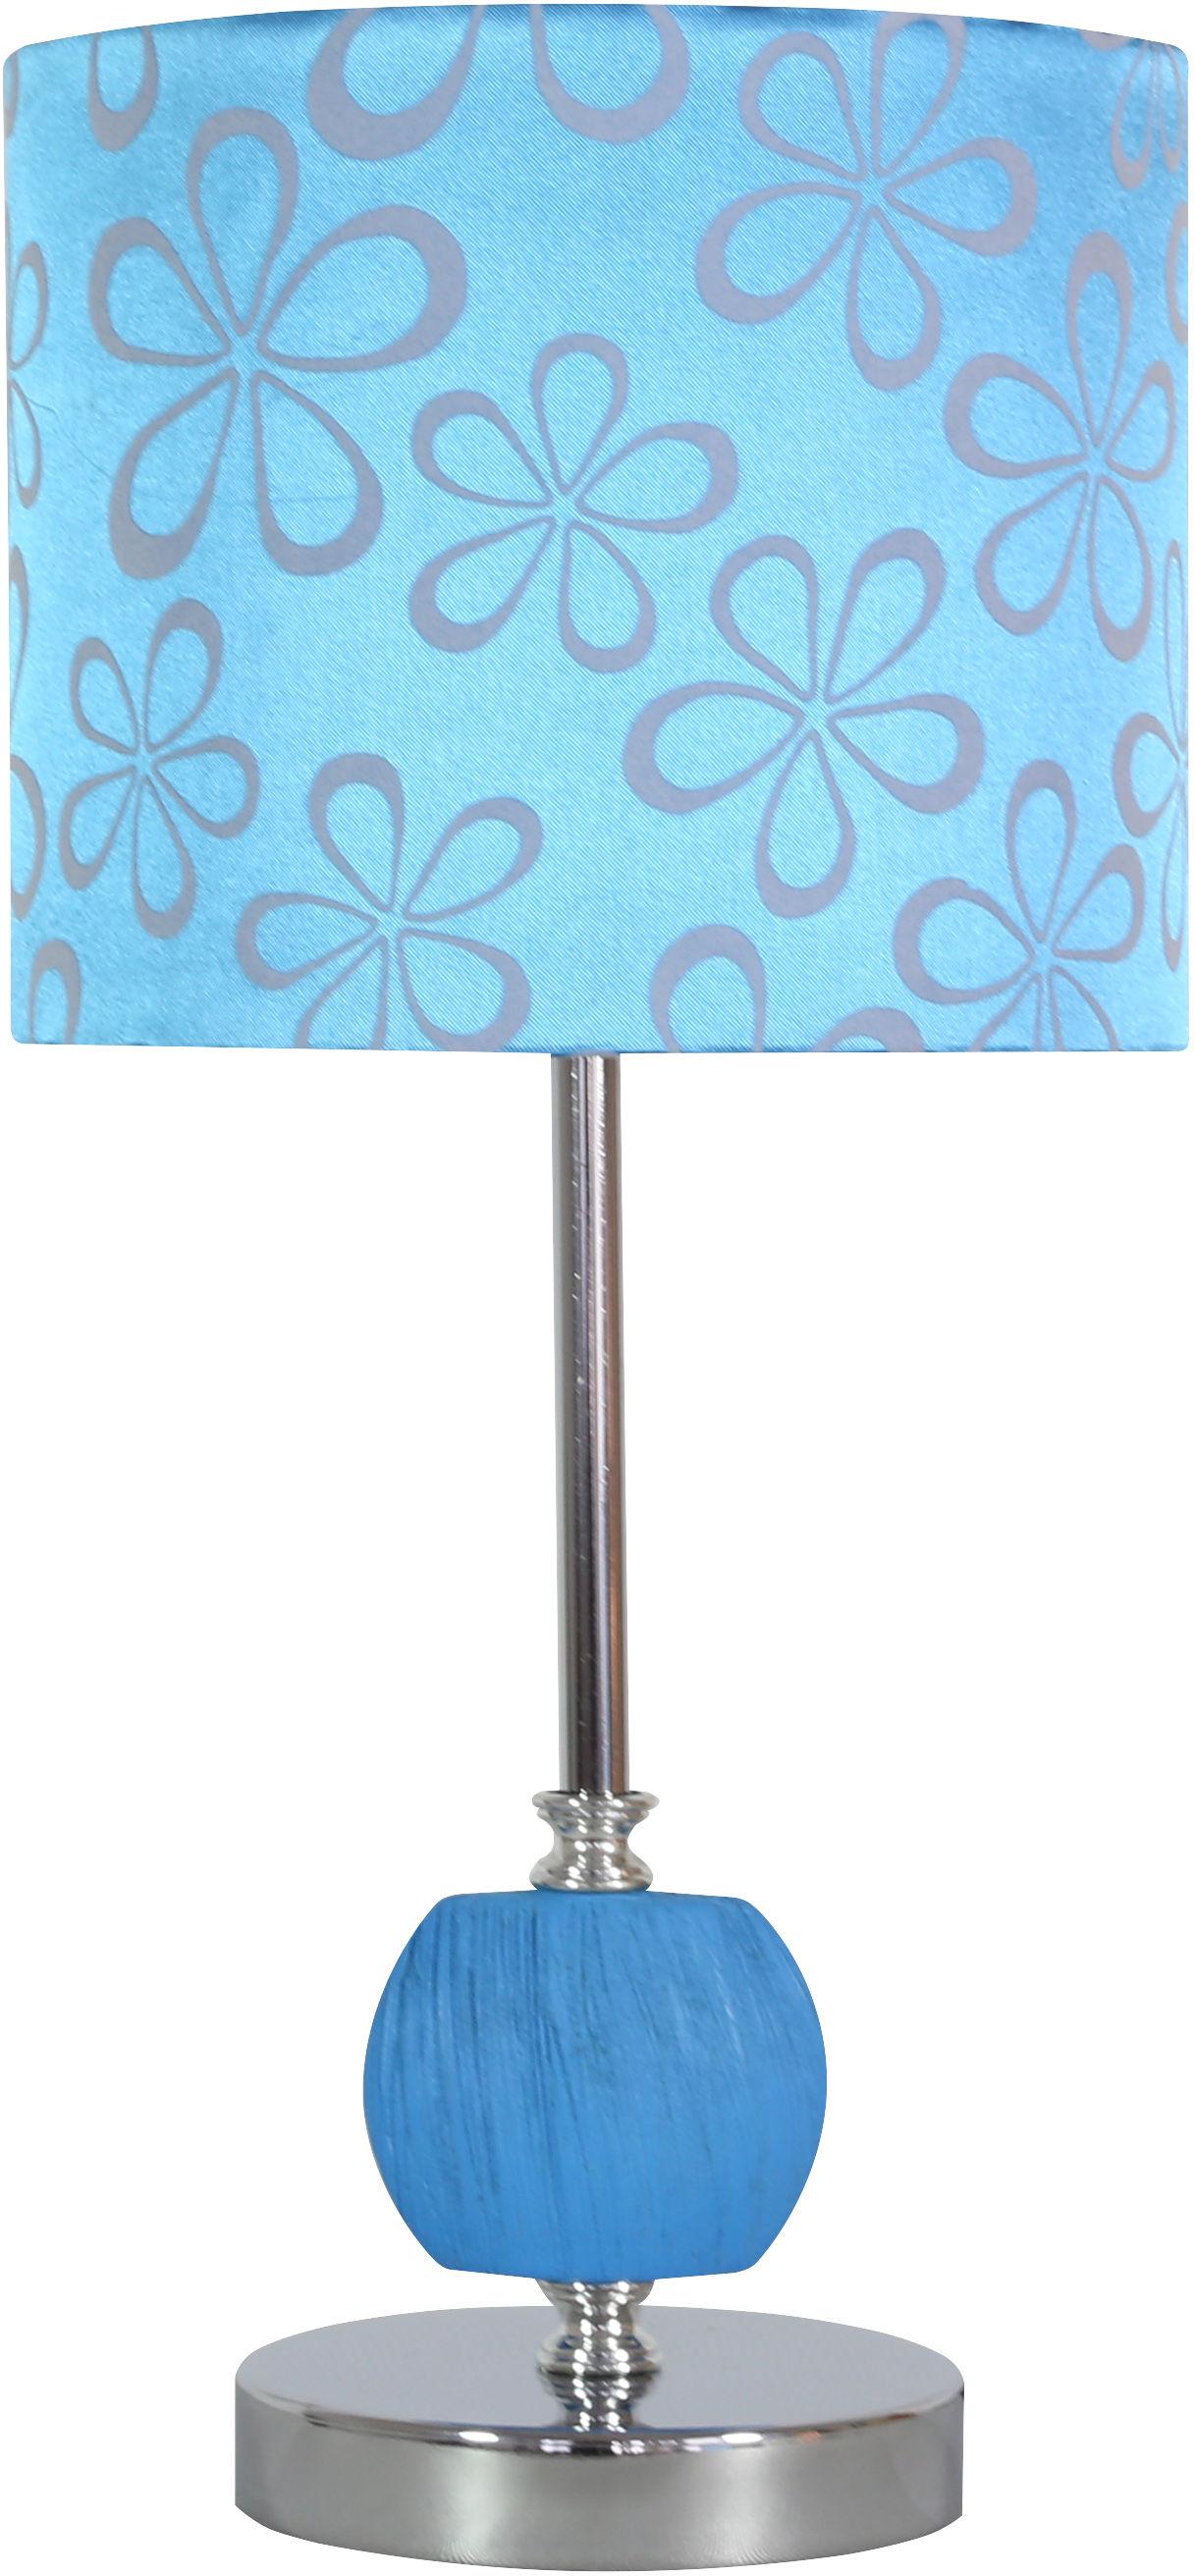 Candellux CORT 41-34625 lampa stołowa abażur niebieska 1X60W E27 19 cm